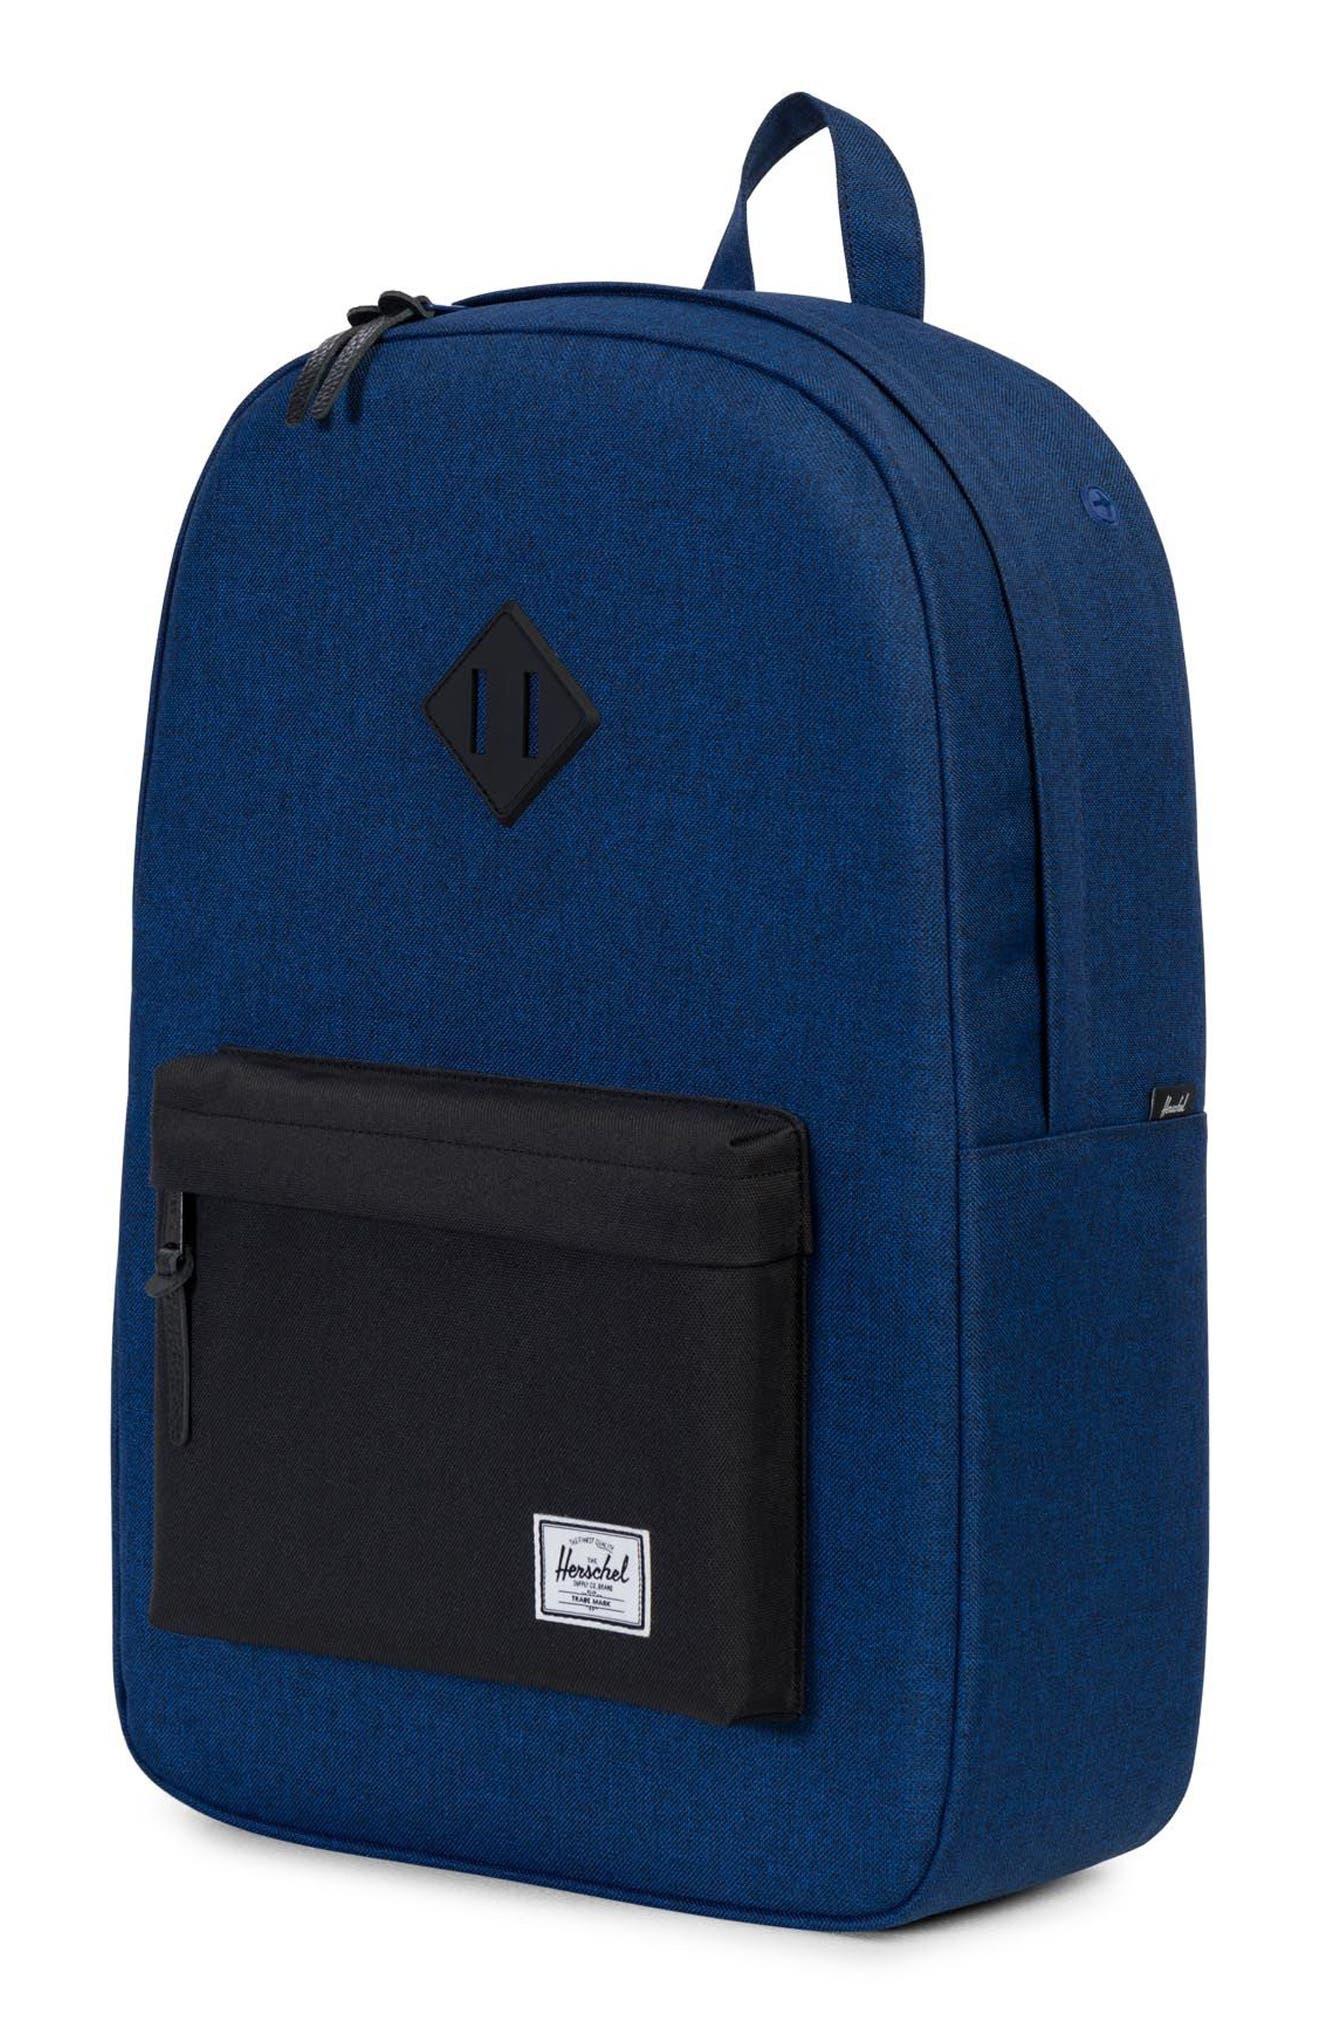 Heritage Backpack,                             Alternate thumbnail 2, color,                             Eclipse Crosshatch/ Black